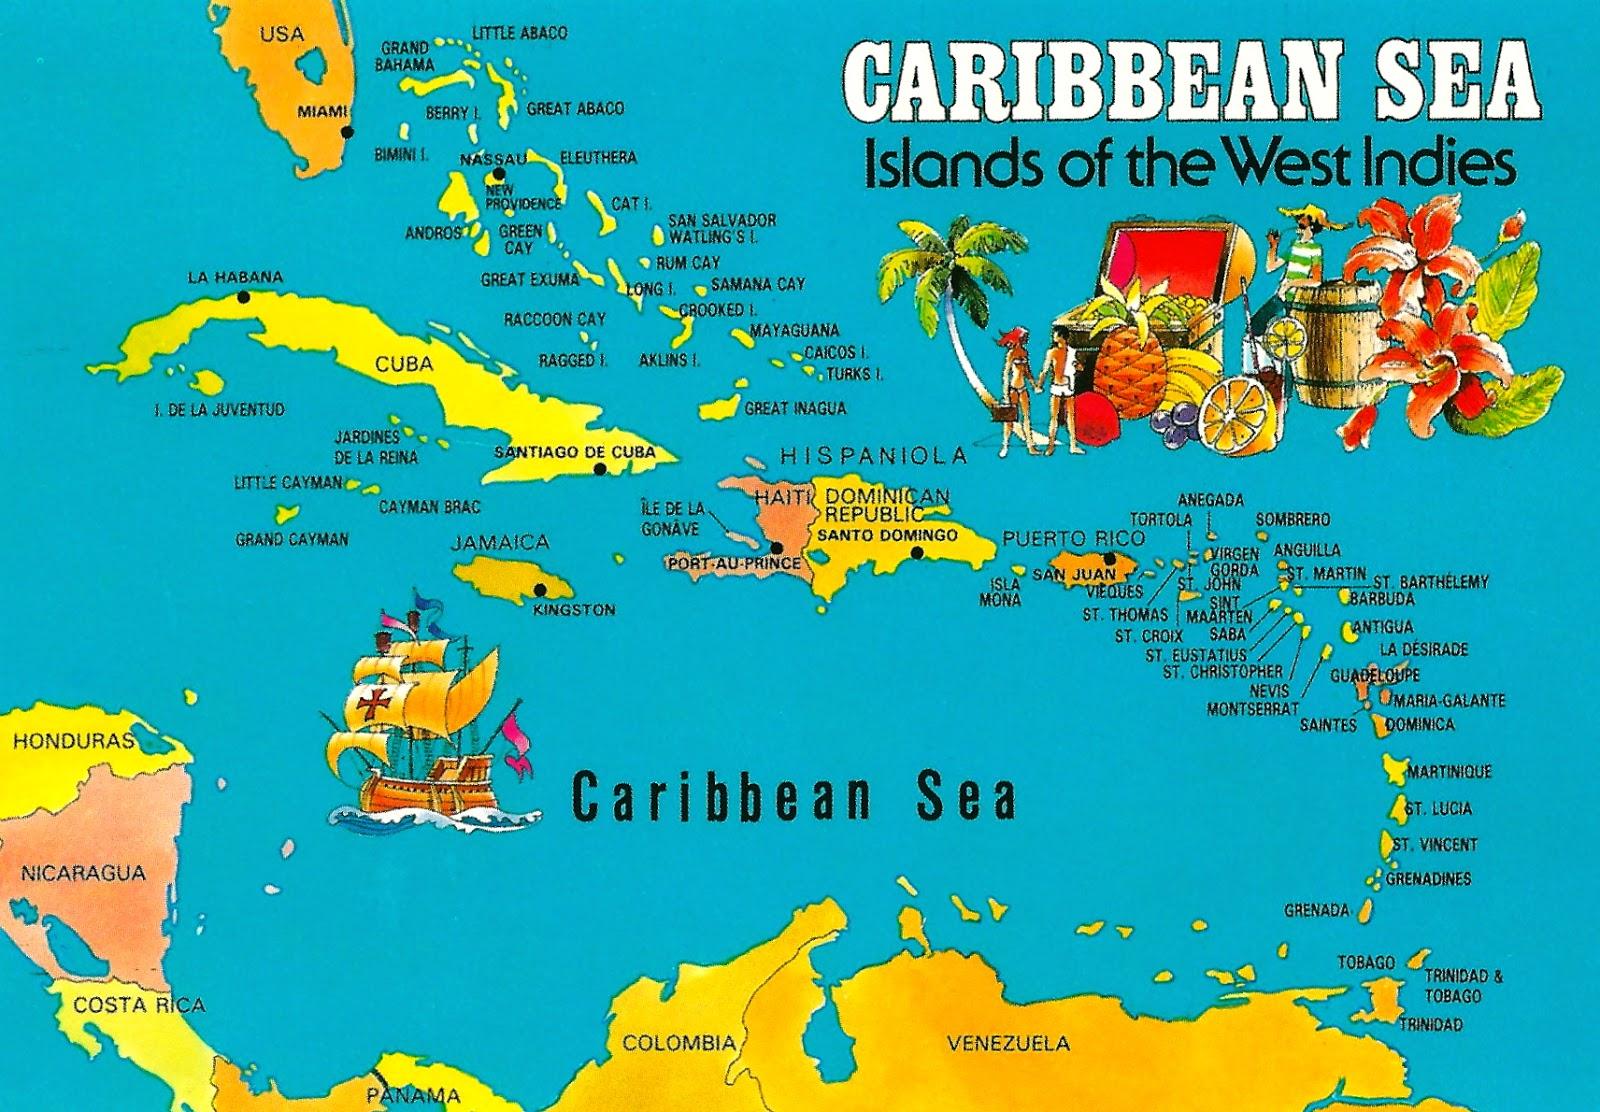 ... Caribbean Islands Map 515e0ae890481 W1500;  Cae19e8963b1c14006fde0ab87e1d9c2; Picture1; Caribbeanmap3; Scan 10 ...